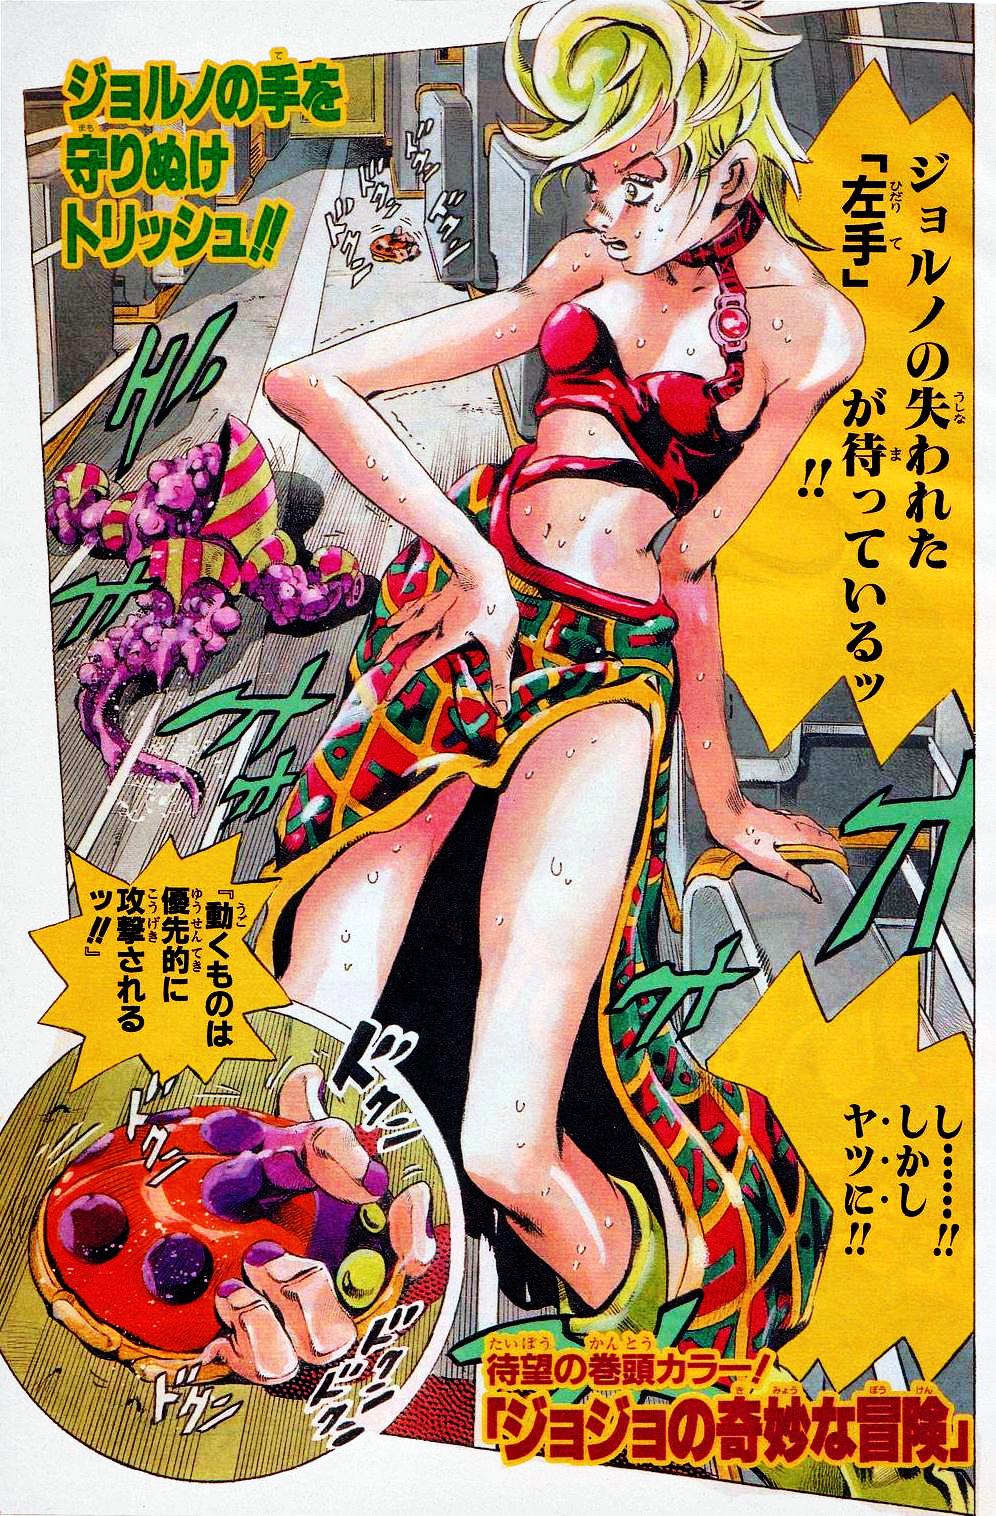 Cover A (Magazine)